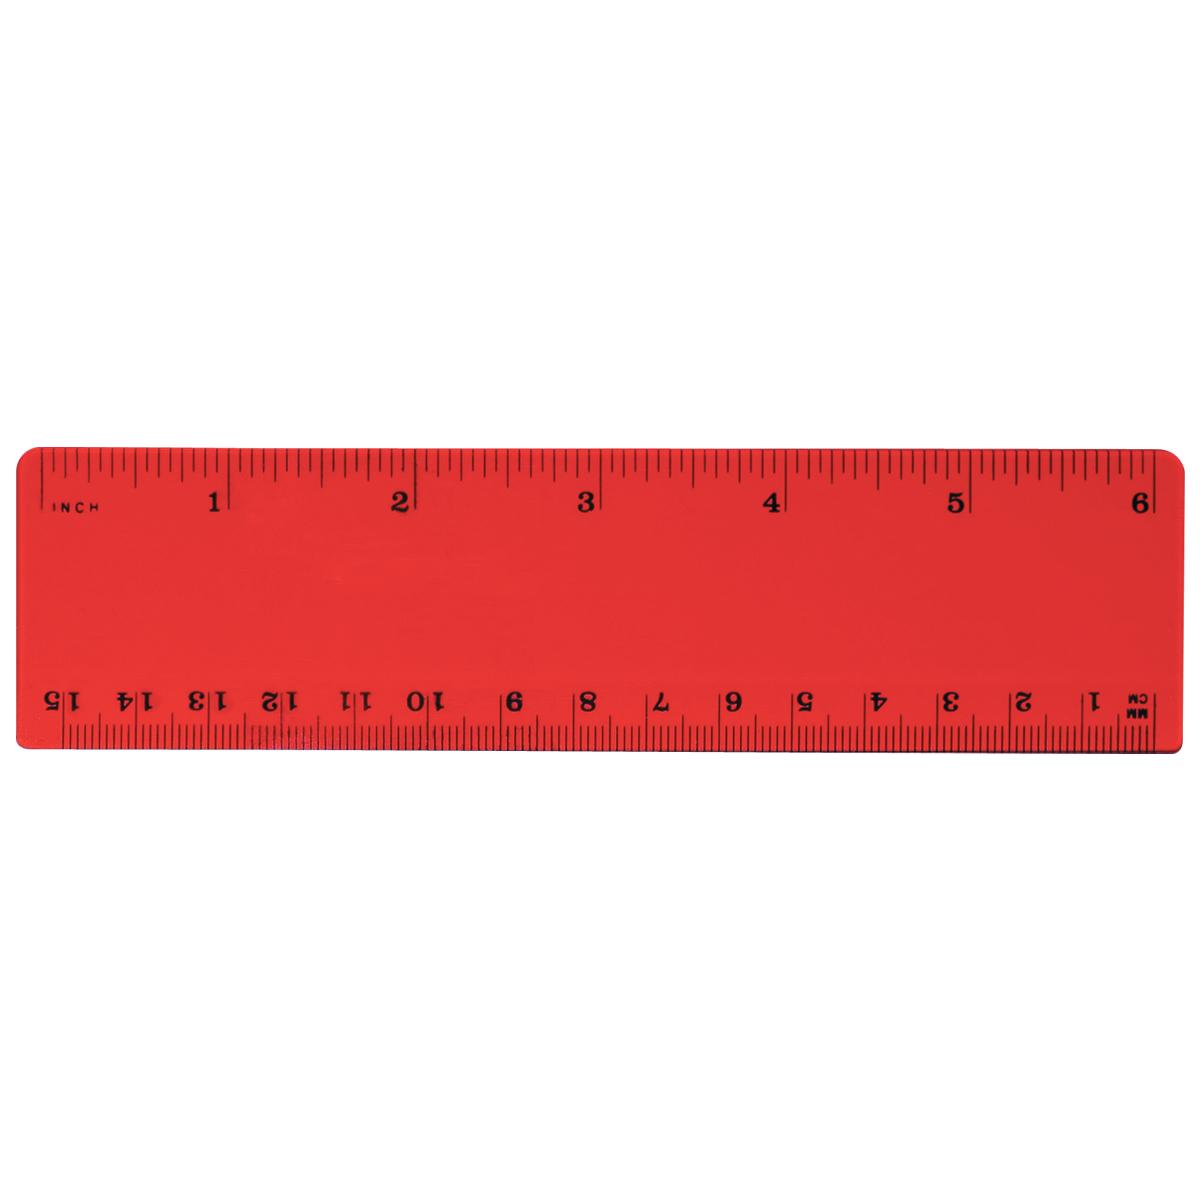 Free cliparts download clip. Clipart ruler short ruler